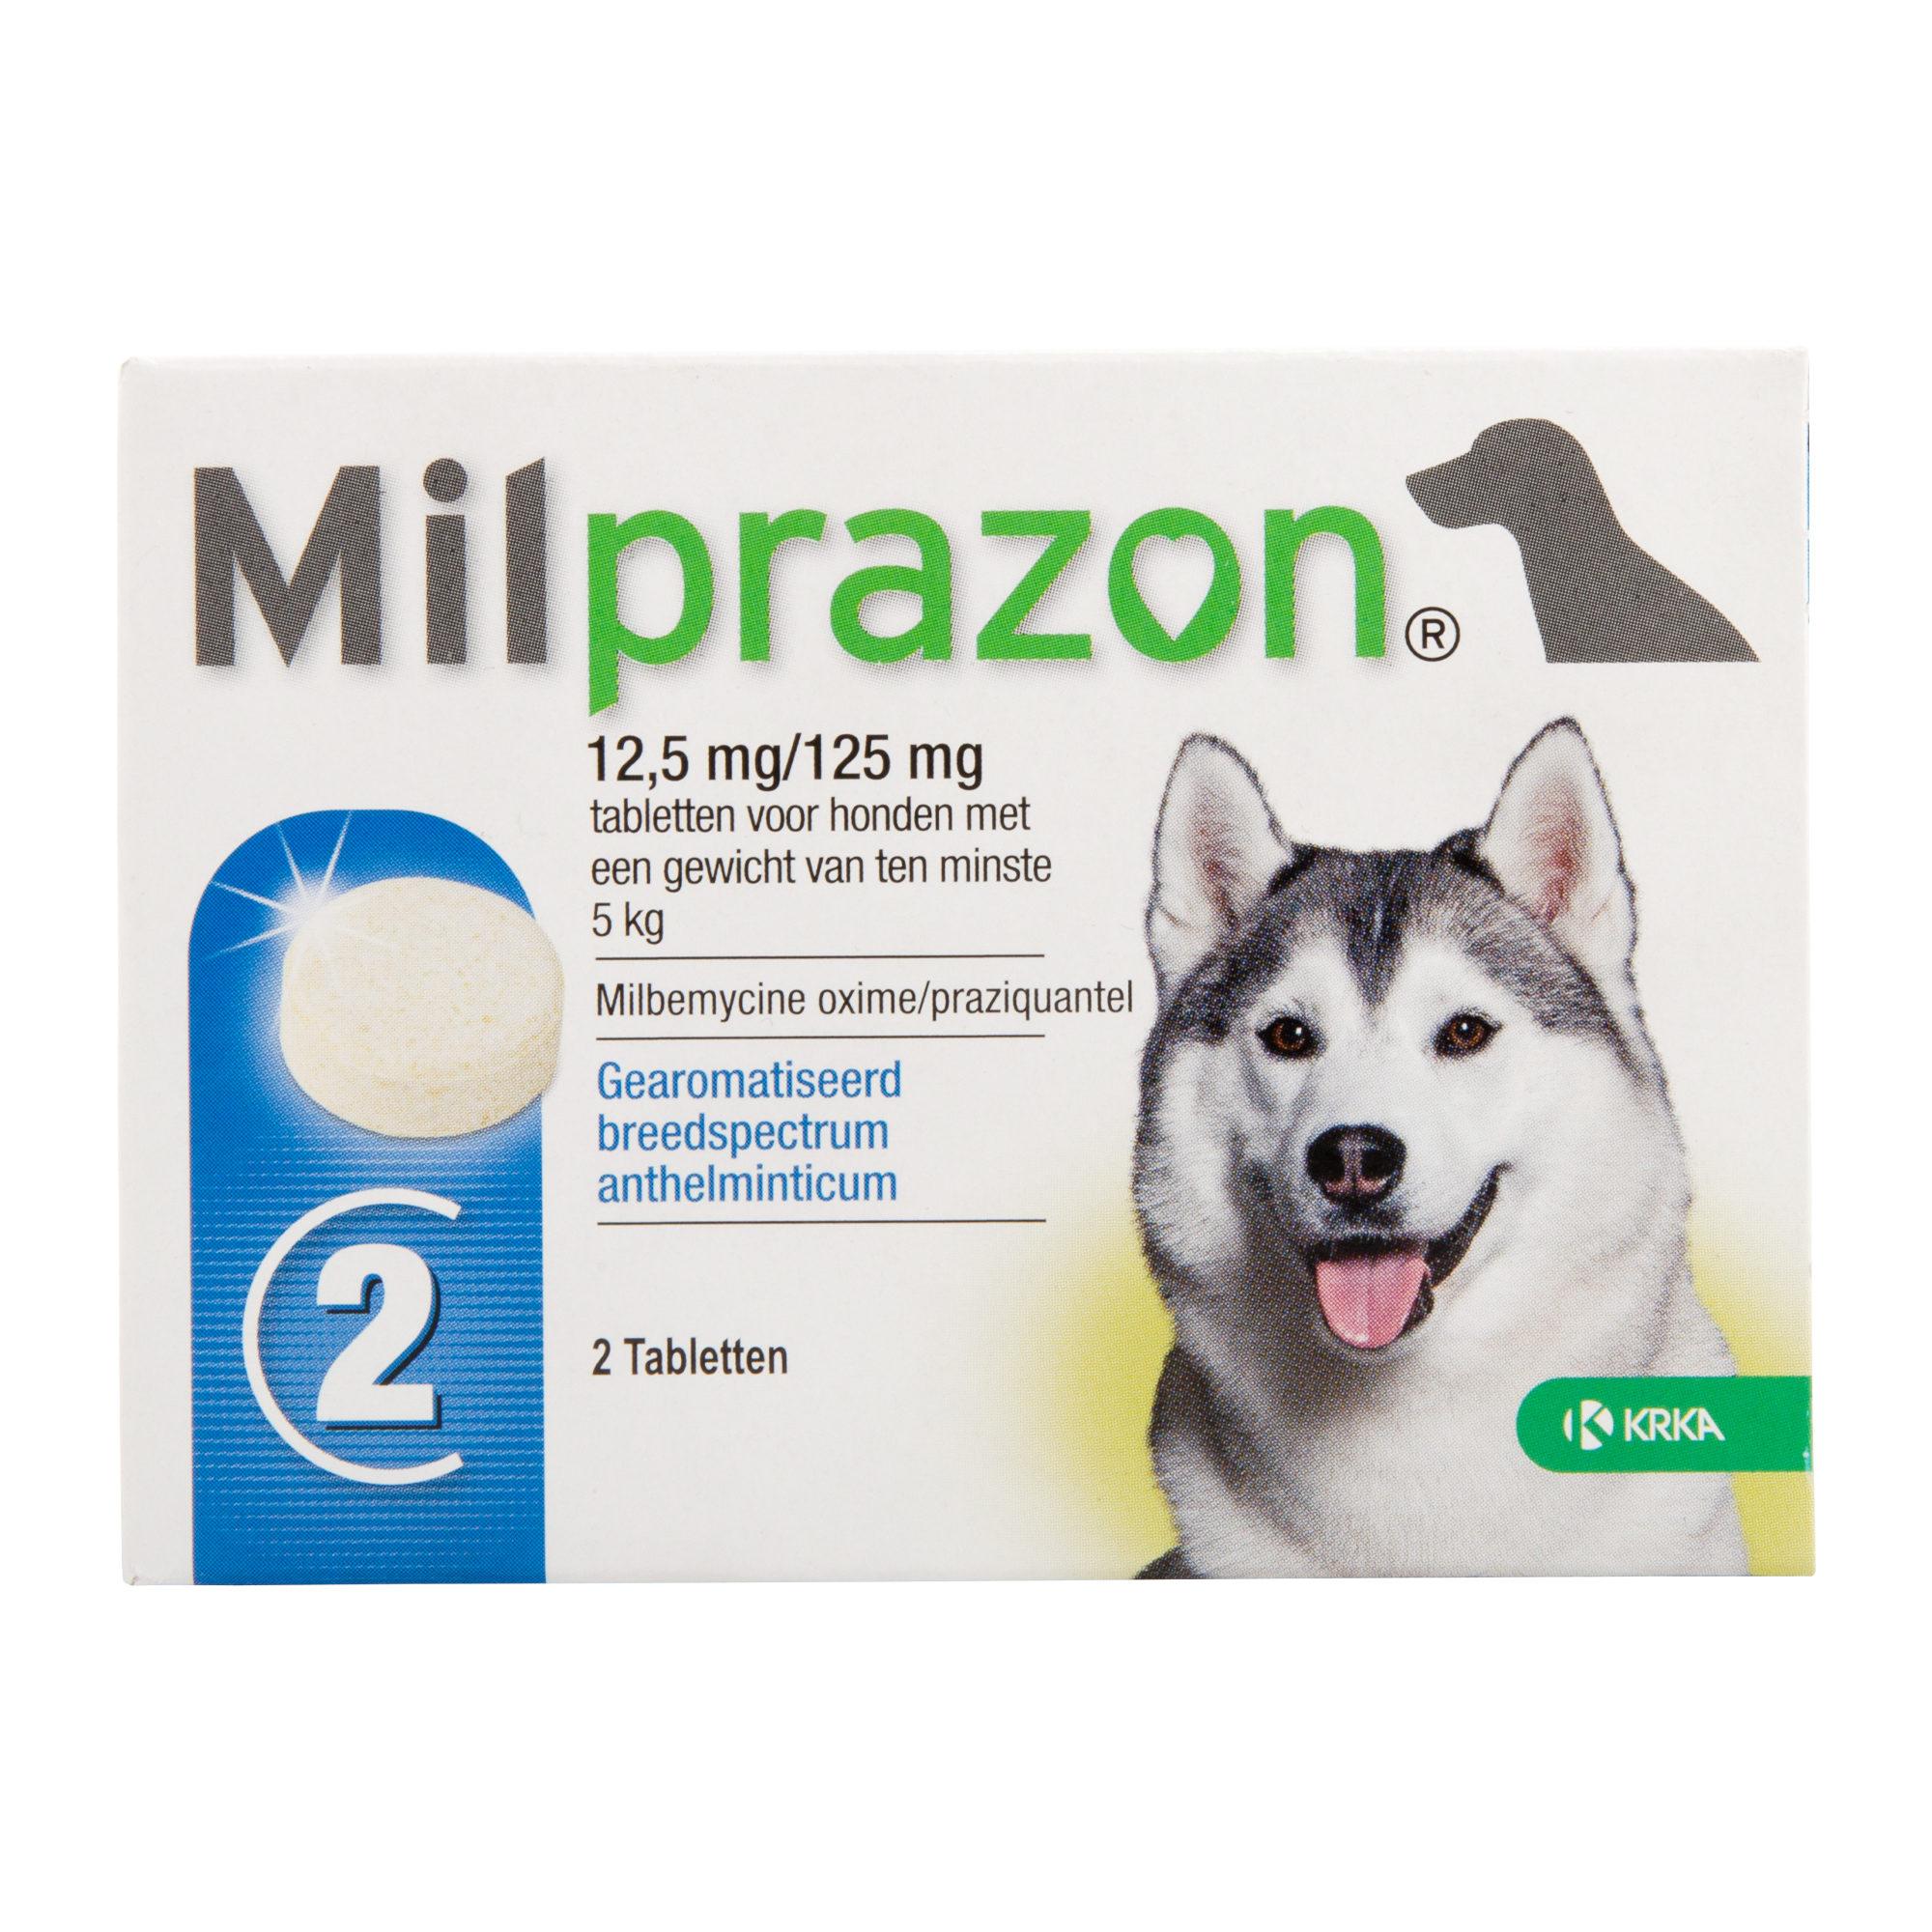 Milprazon - große Hunde (12,5 mg)